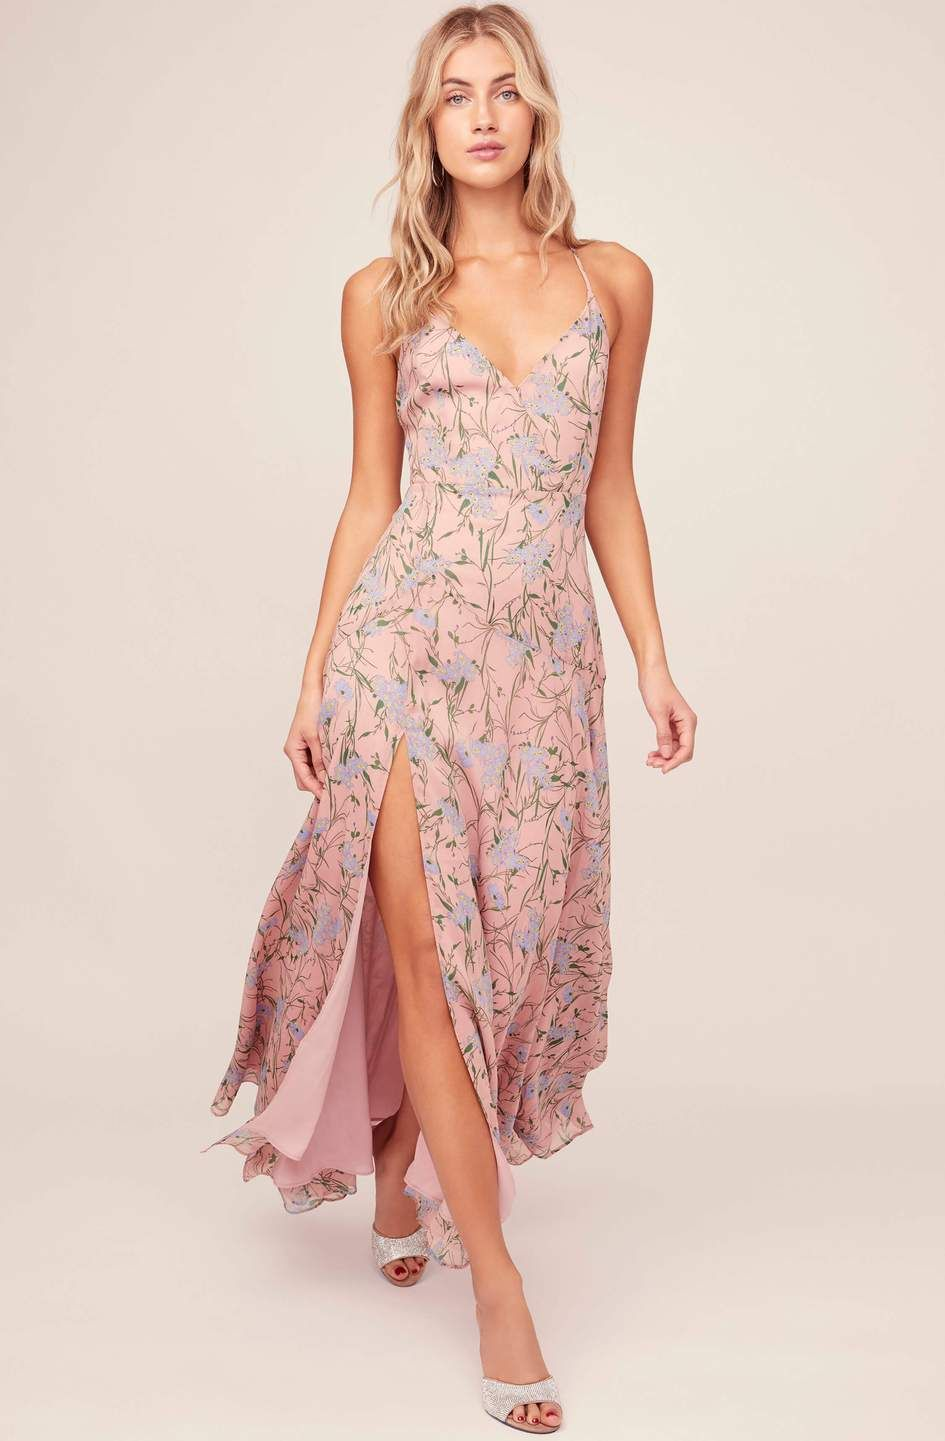 Pandora Floral Maxi Dress Astr The Label Floral Maxi Dress Maxi Sundress Fashion Clothes Women